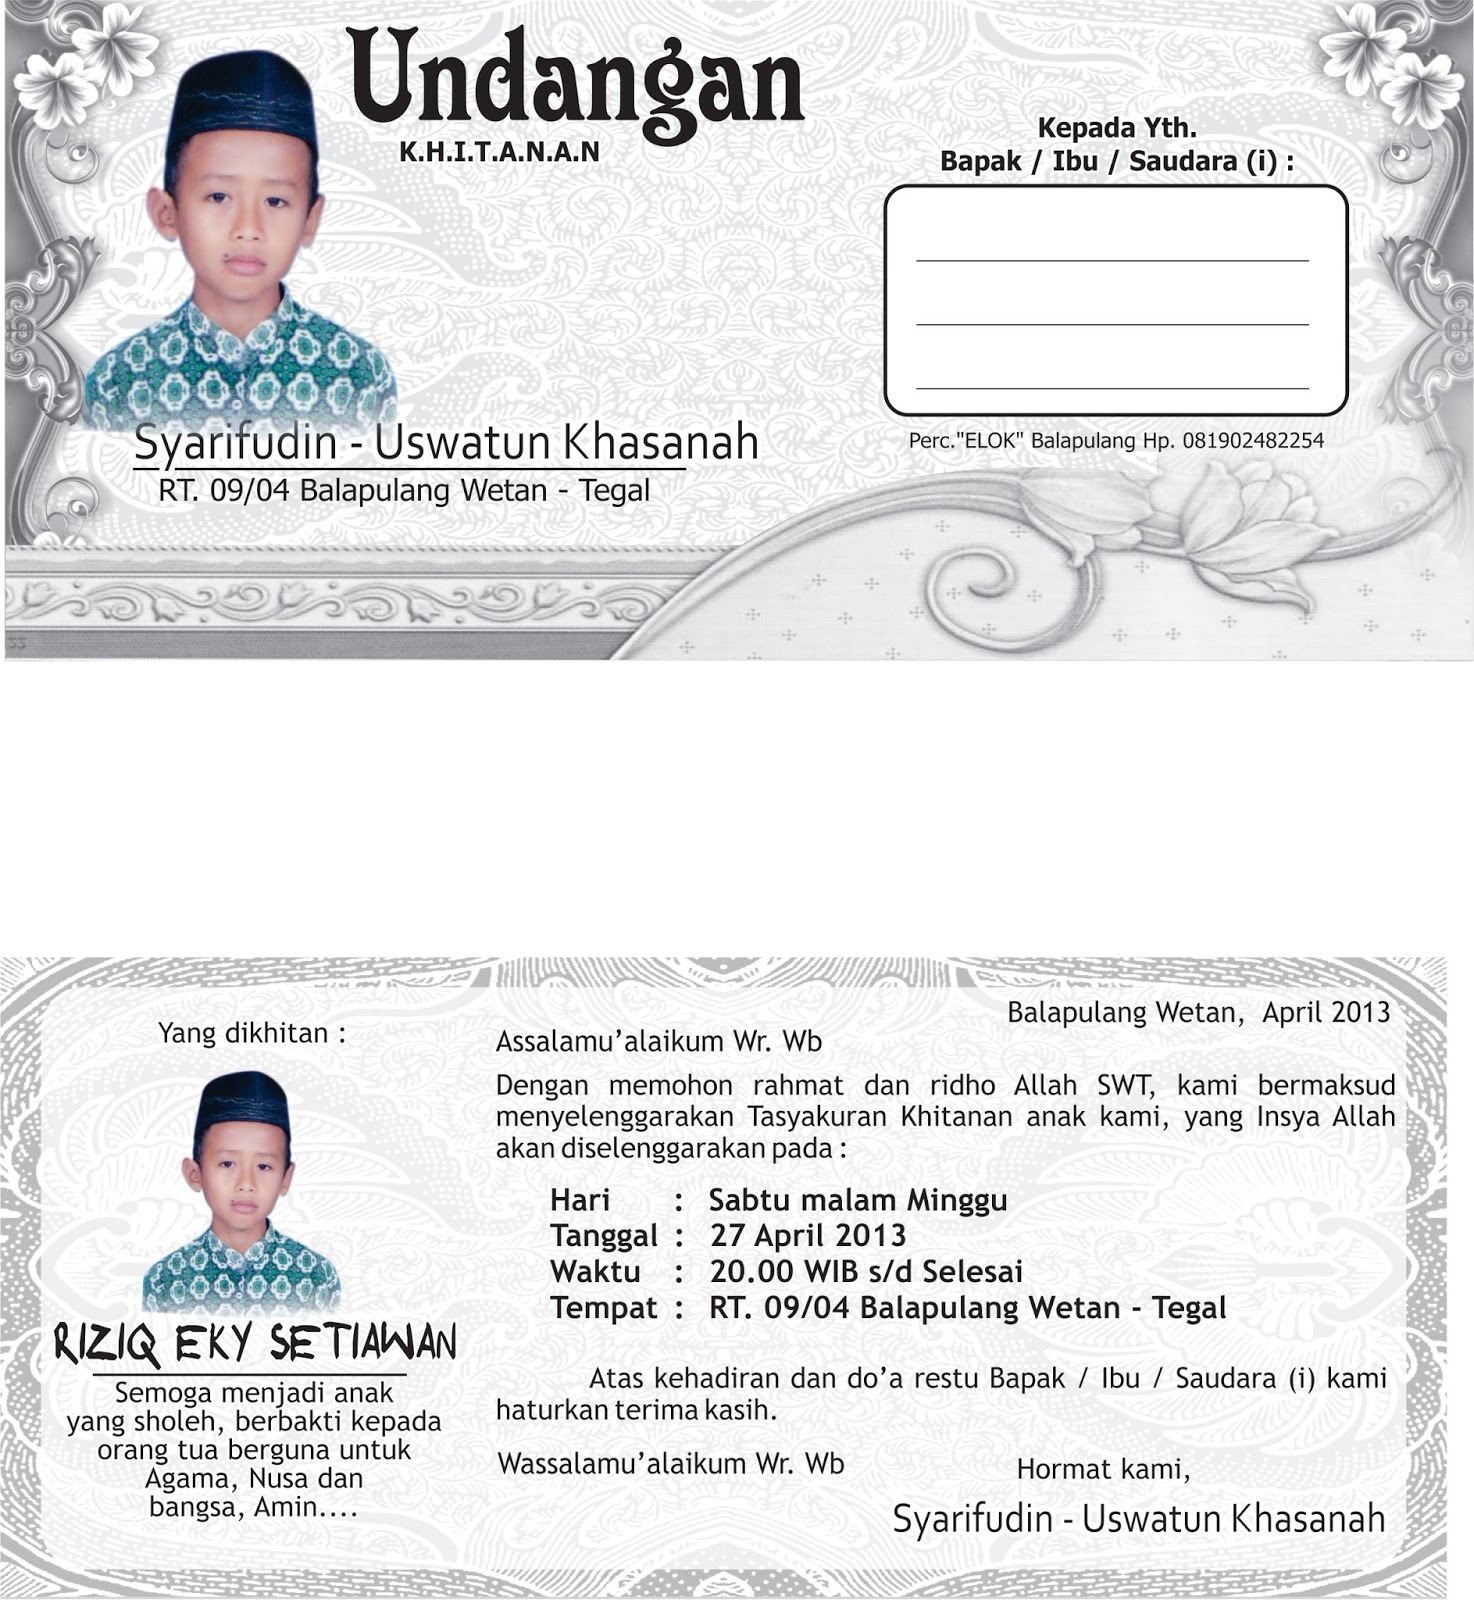 400 Koleksi Contoh Undangan Syukuran Haji Cdr Gratis Terbaru Contoh Undangan